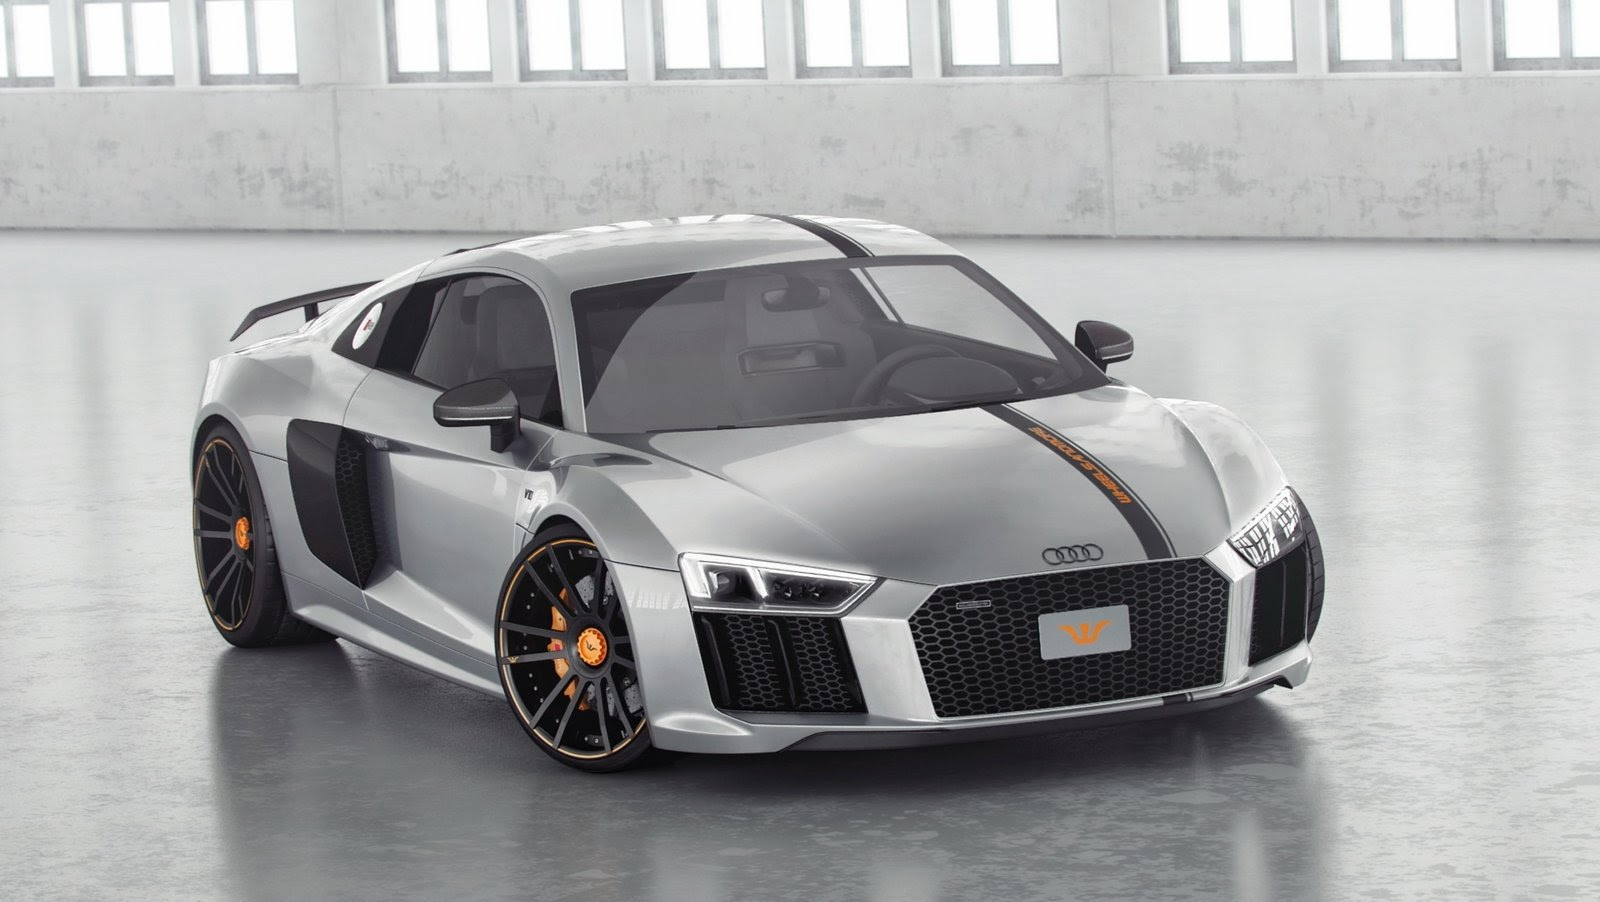 2016 Audi R8 V10 Plus Beastie Toys By Wheelsandmore Top